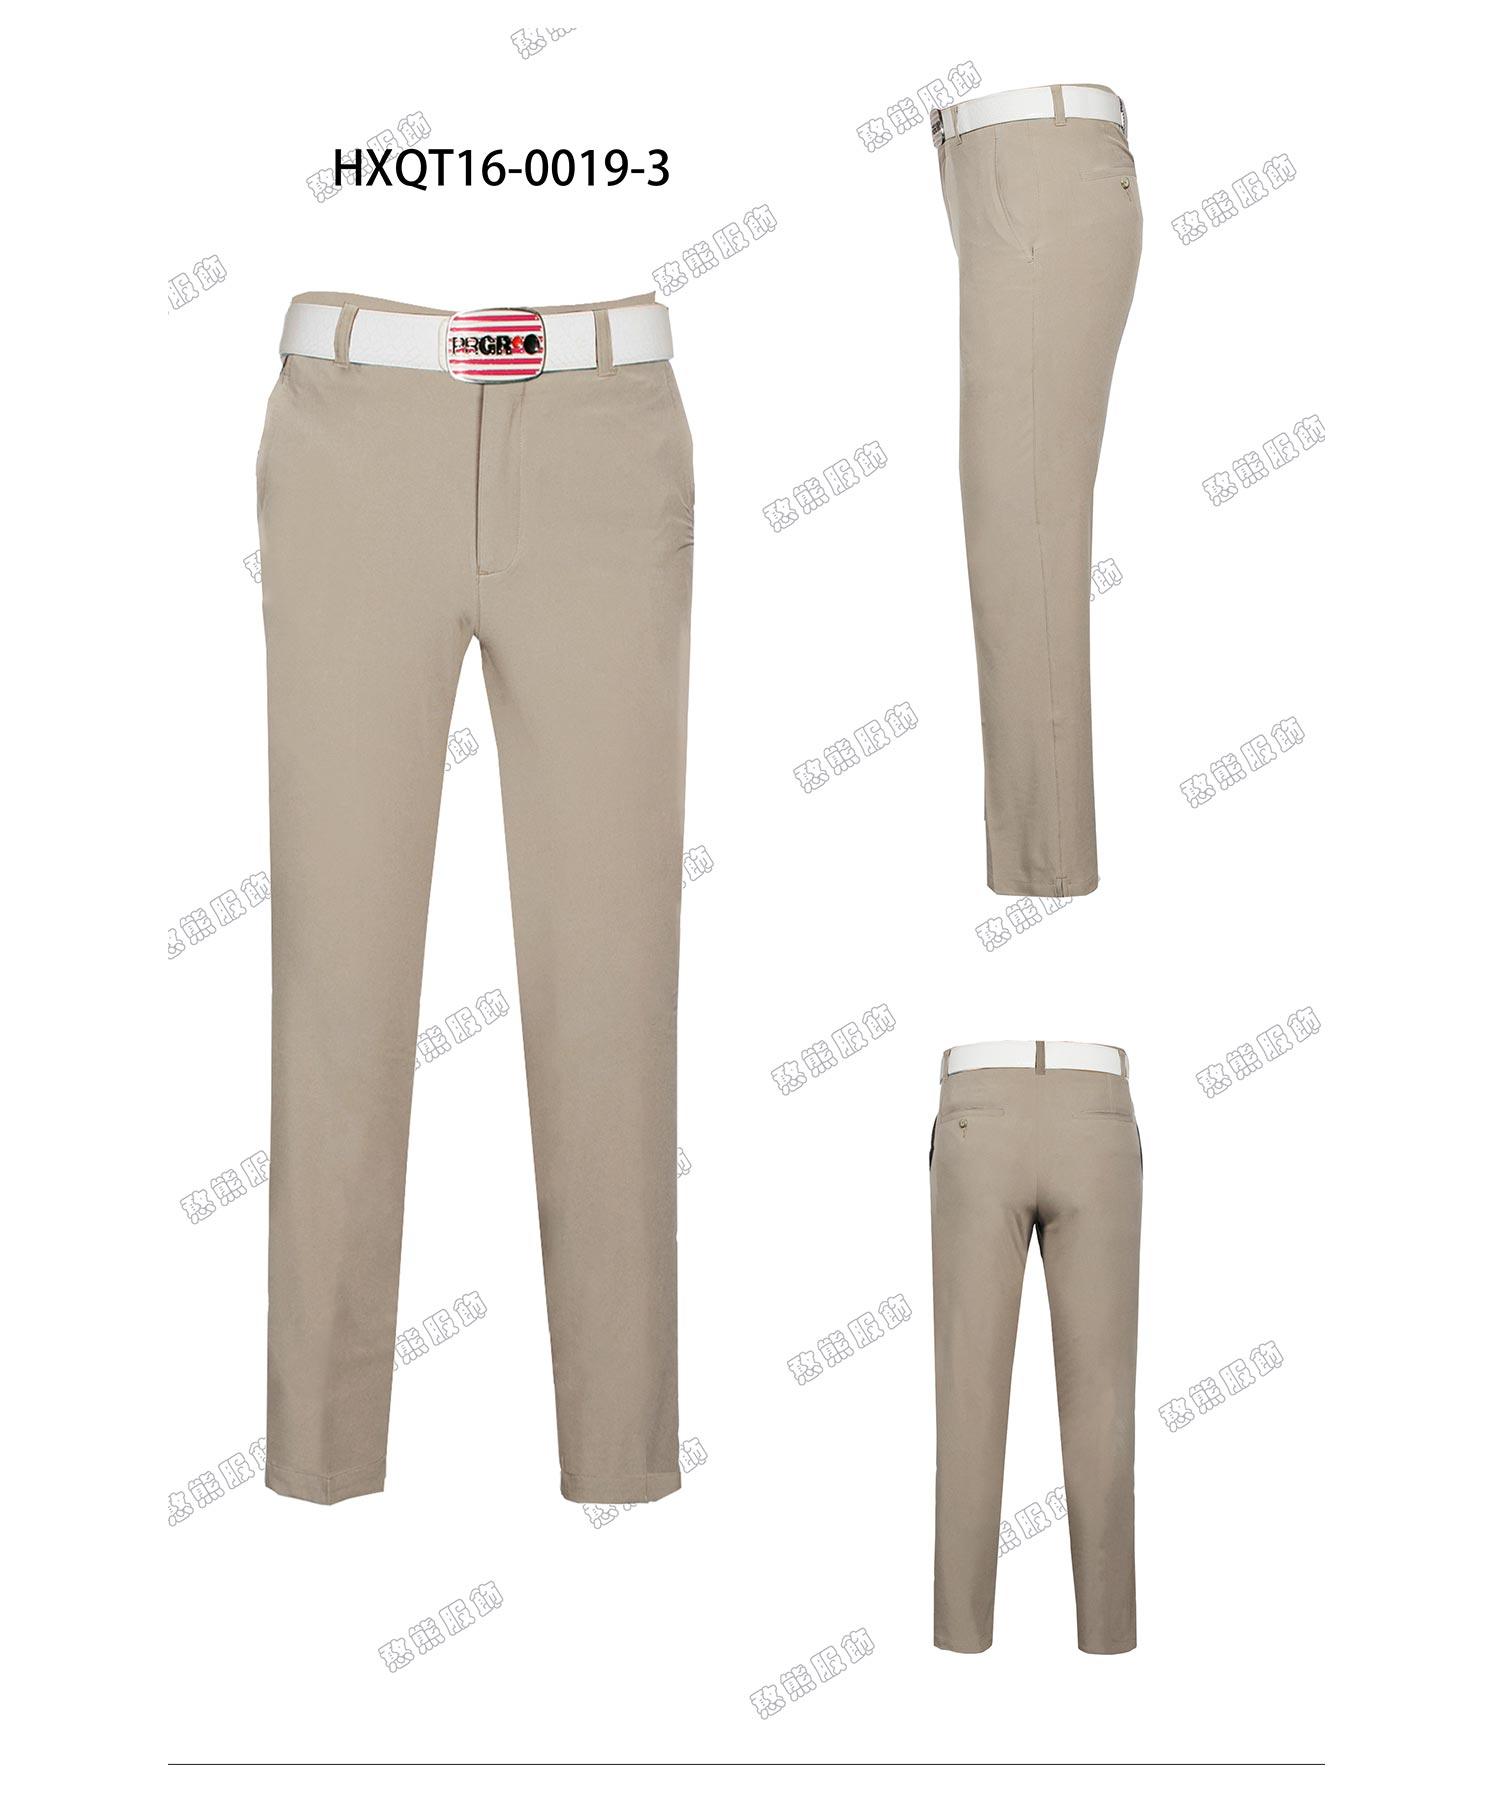 HXQT16-0019-3